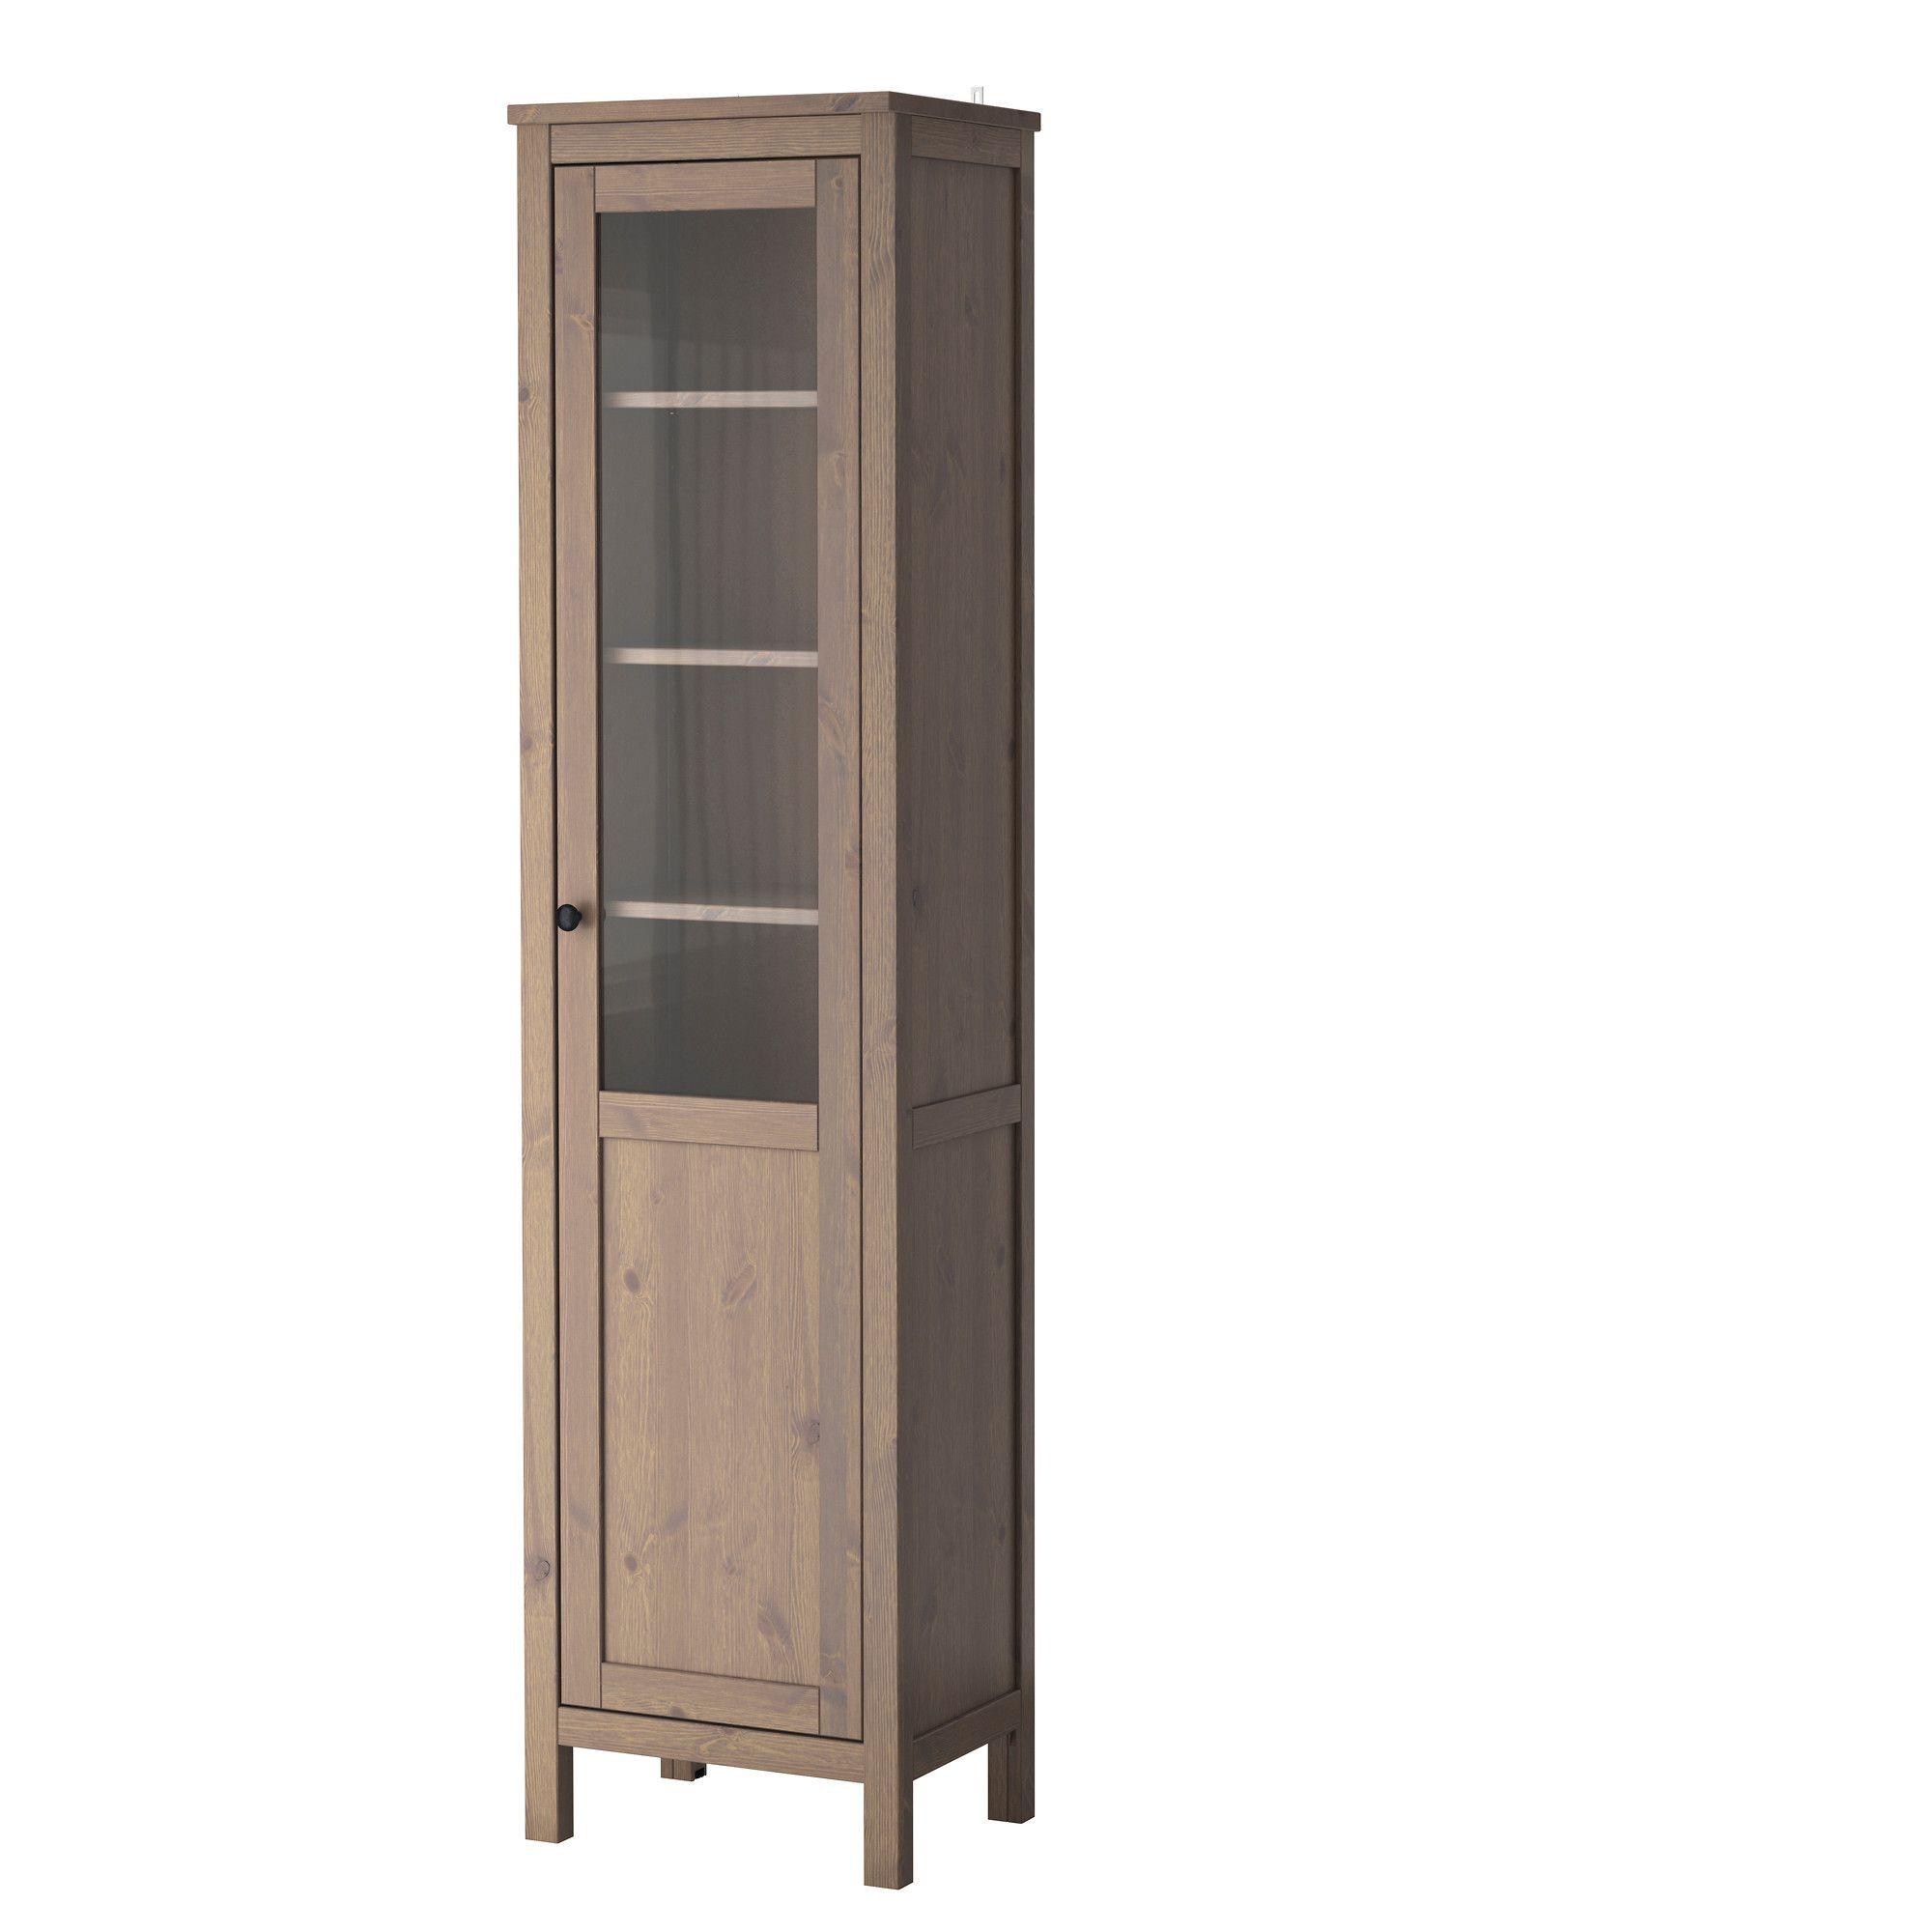 hemnes armoire avec porte semi vitr e gris brun ikea meubles salon pinterest hemnes. Black Bedroom Furniture Sets. Home Design Ideas